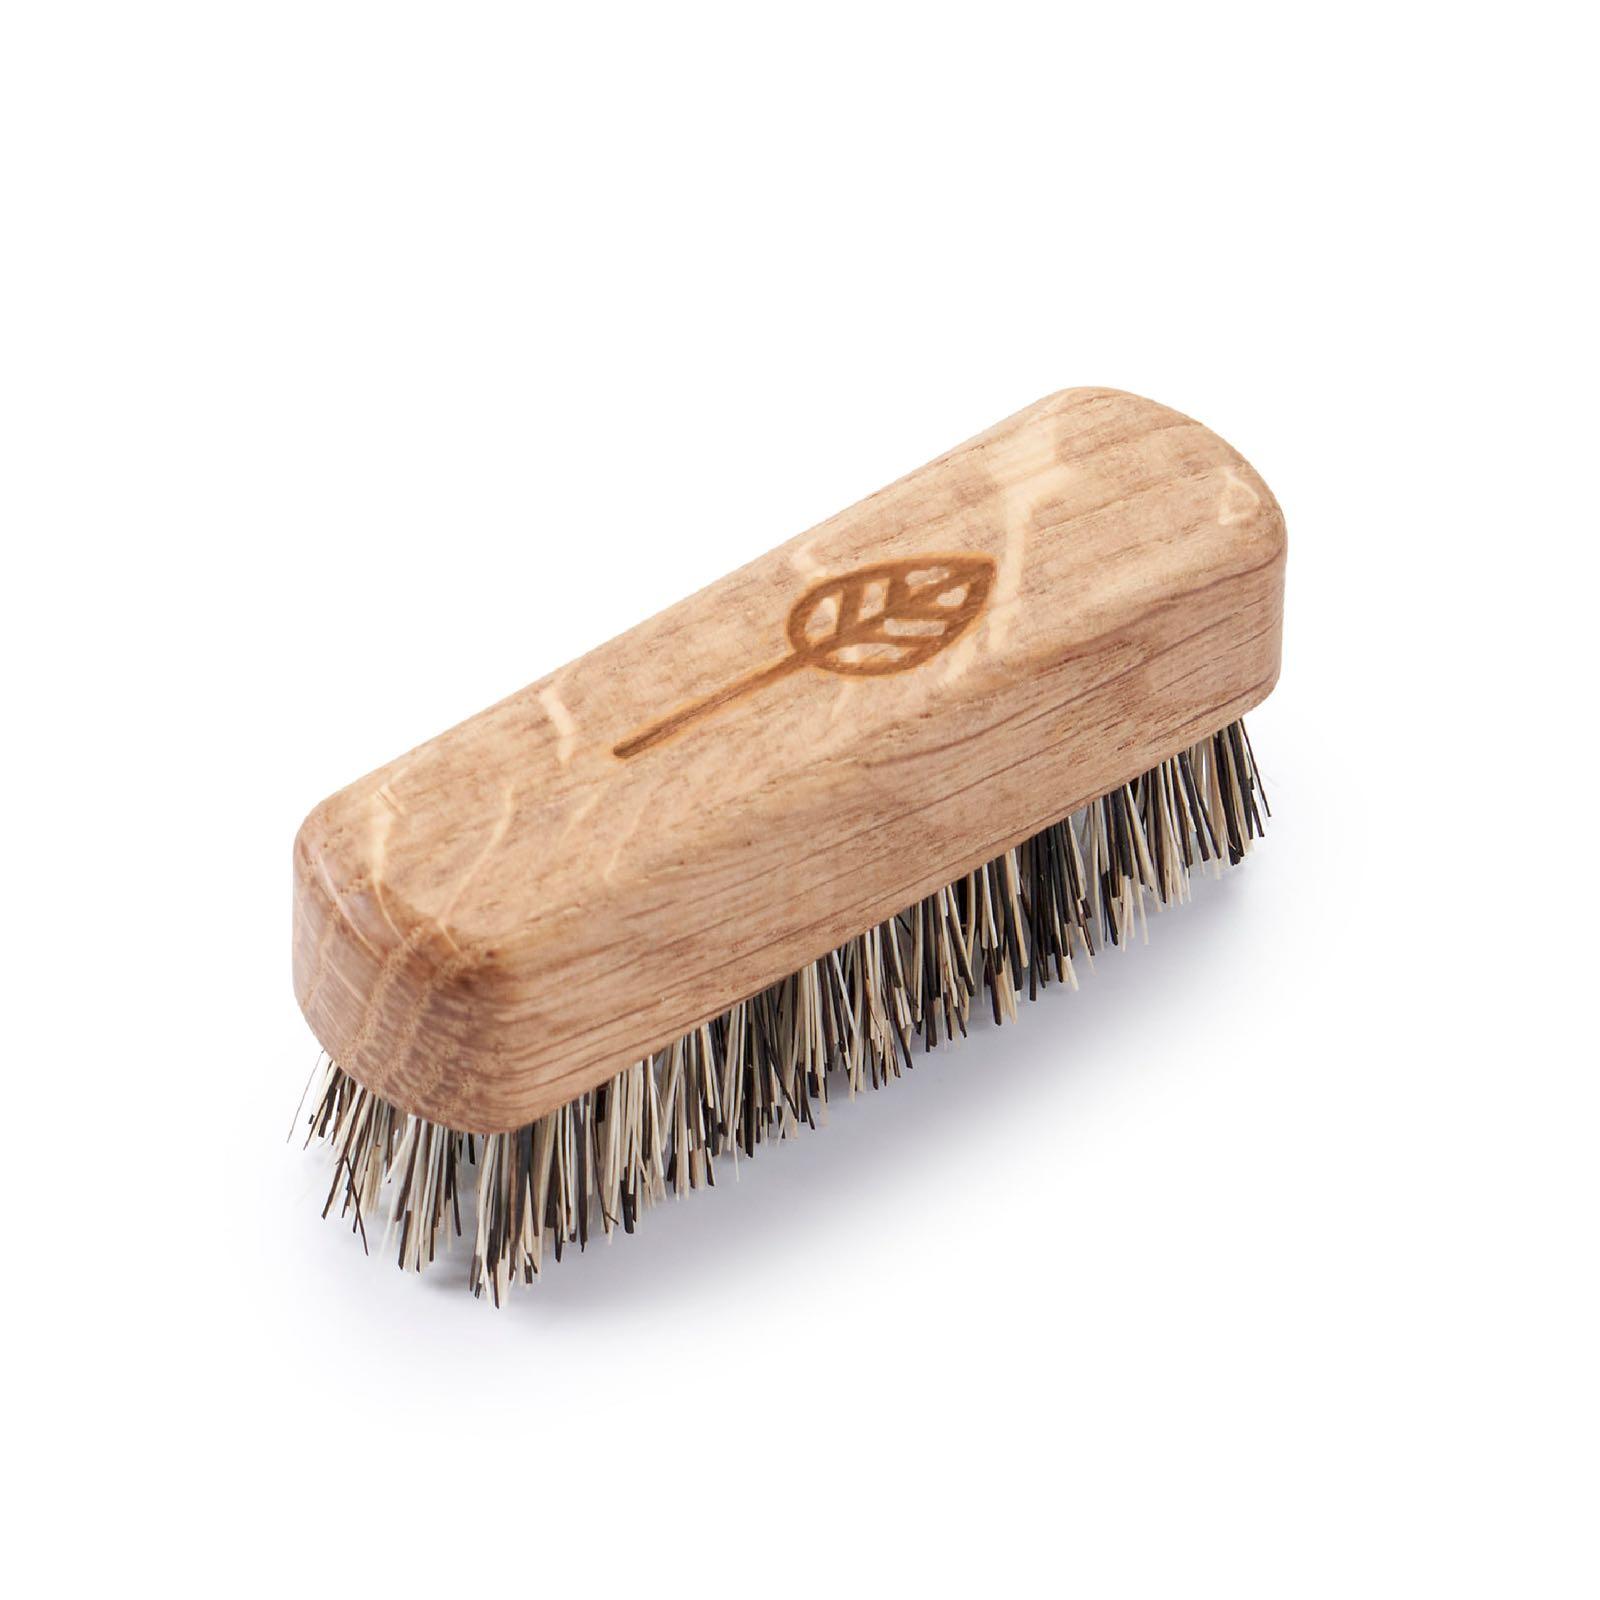 Beard brush by eco